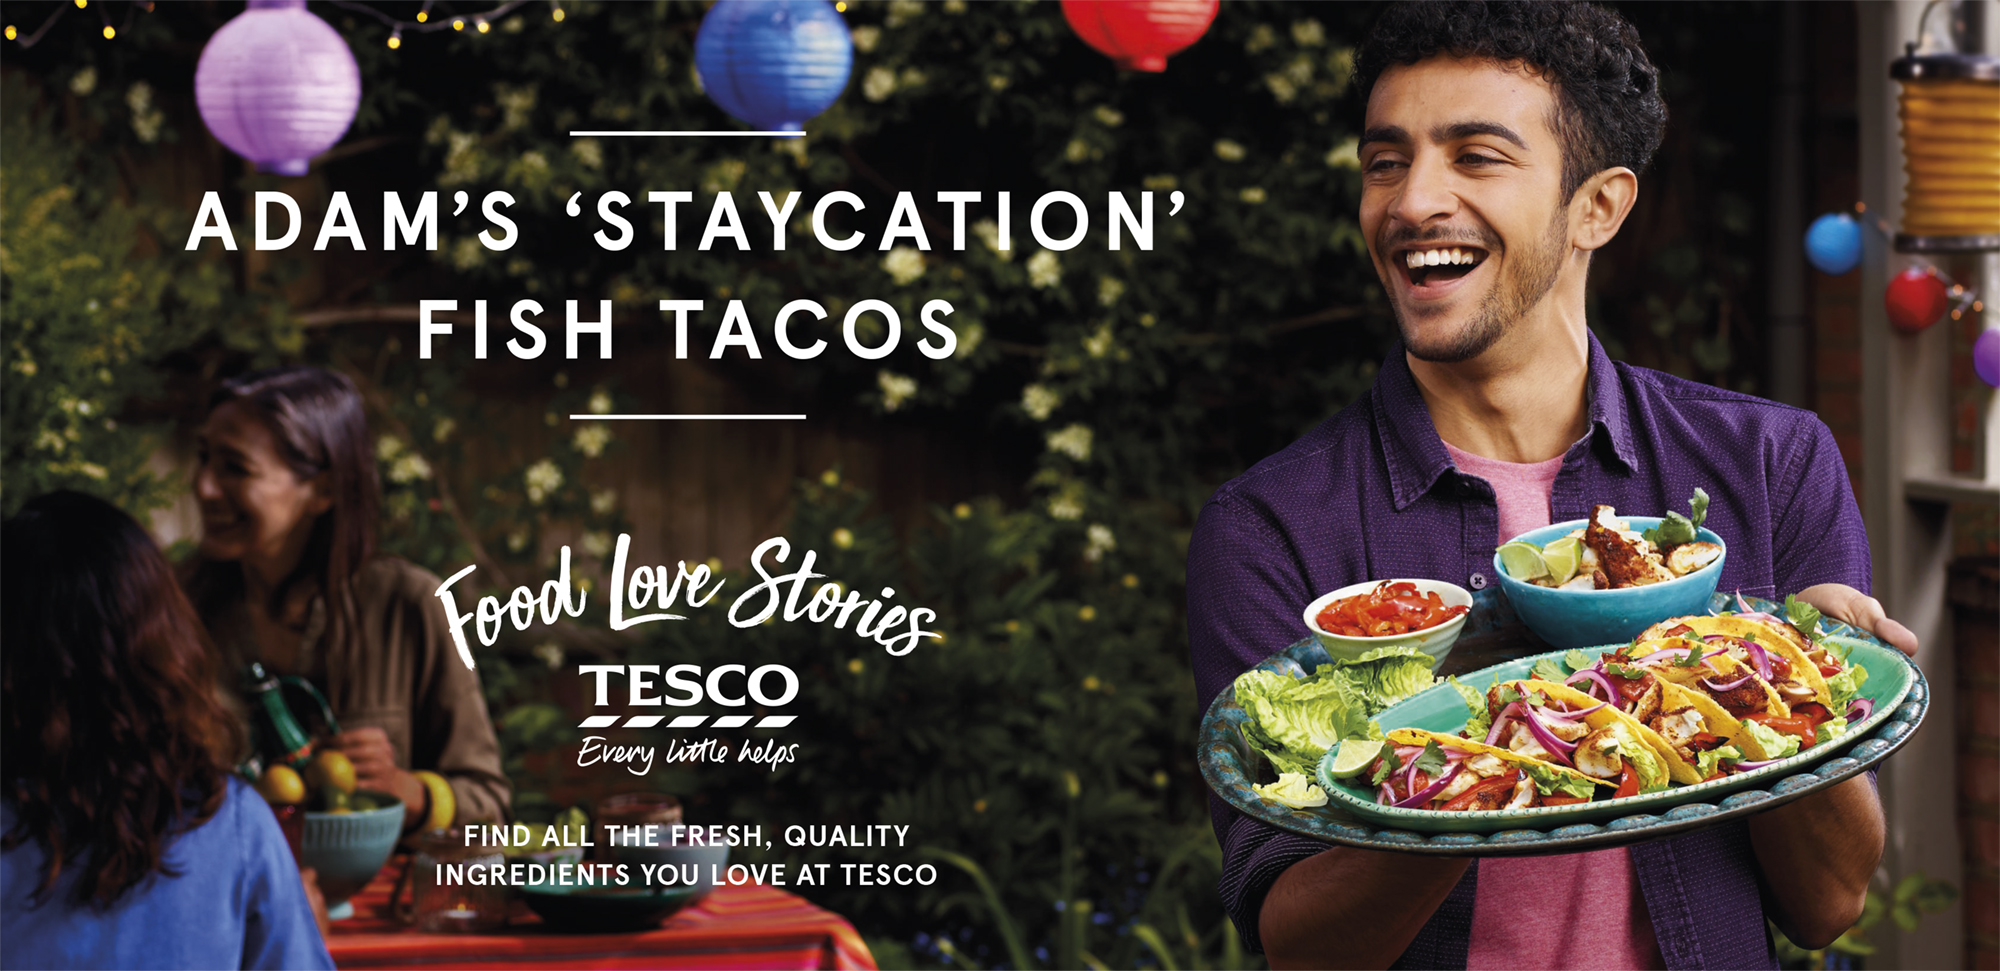 54671_FoodStories_Tacos_48sht_scr.jpg